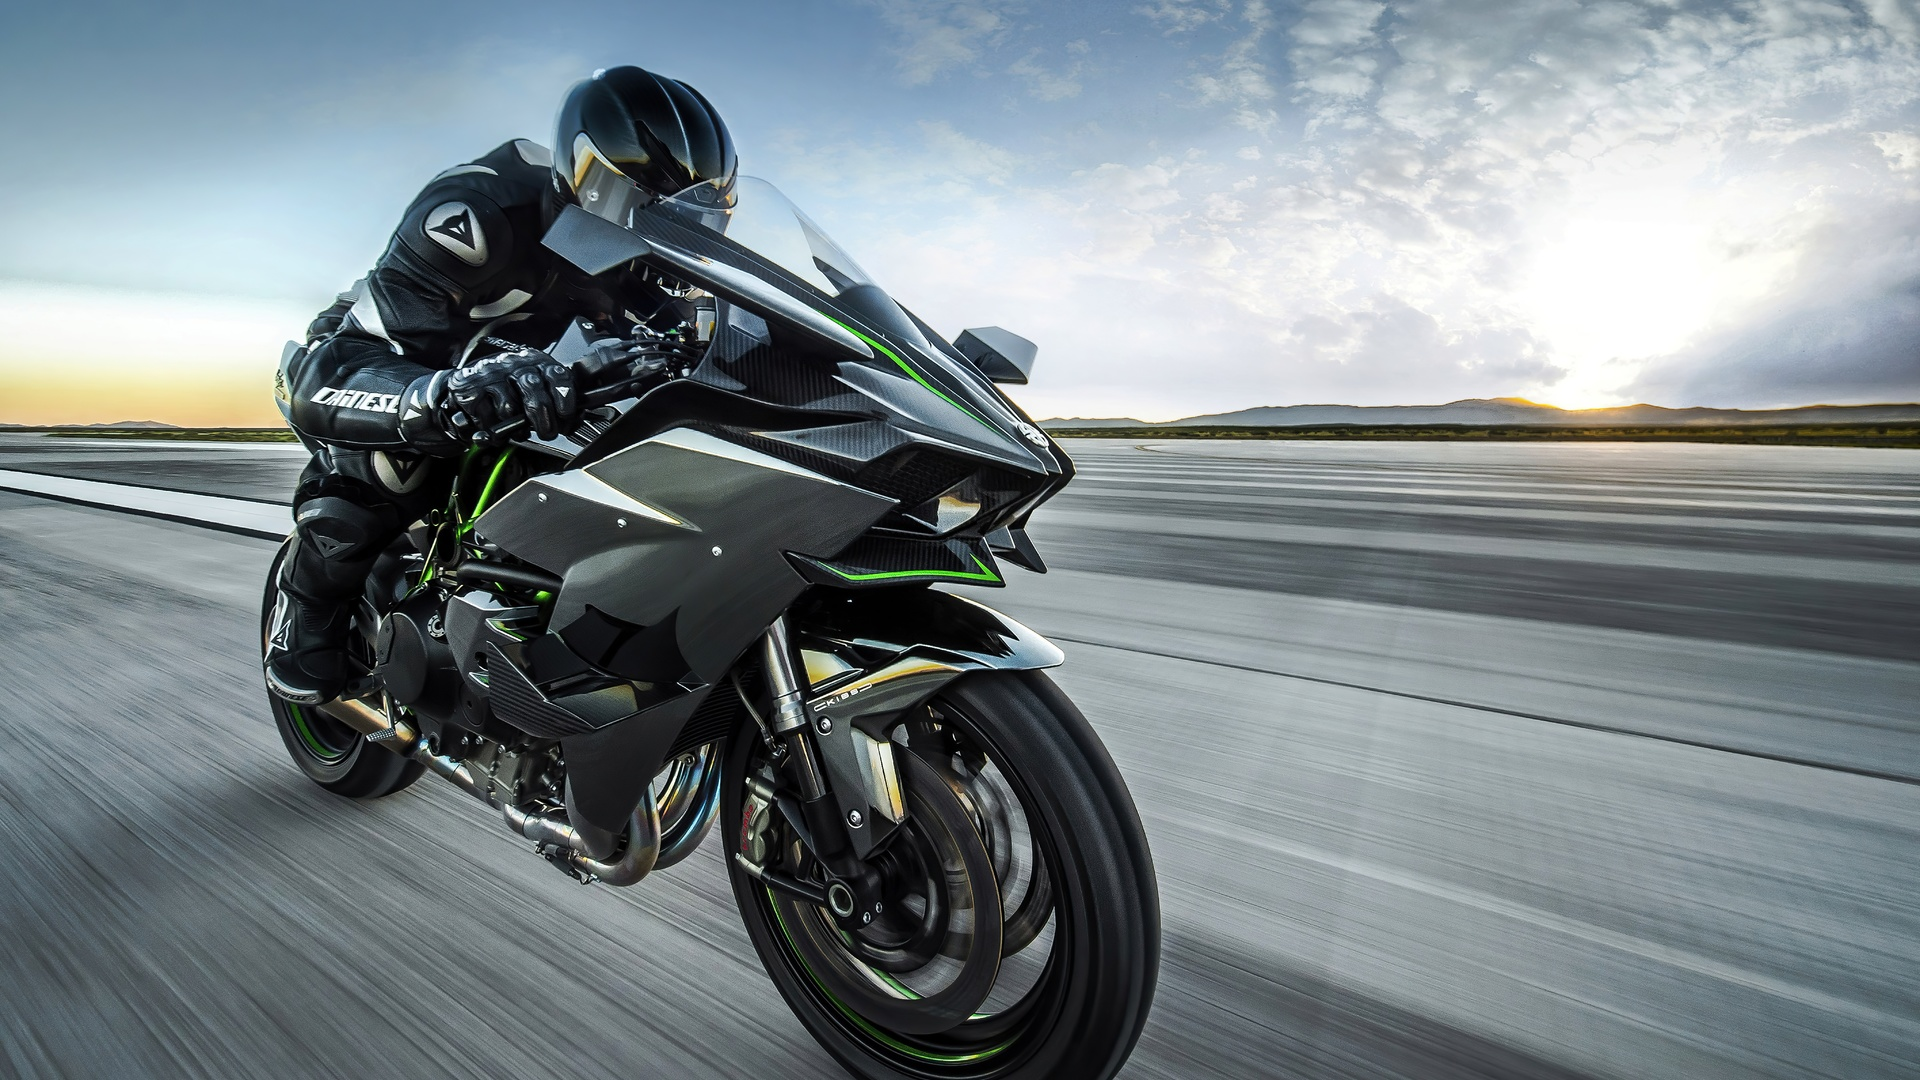 дорога, мотоциклист, скорость